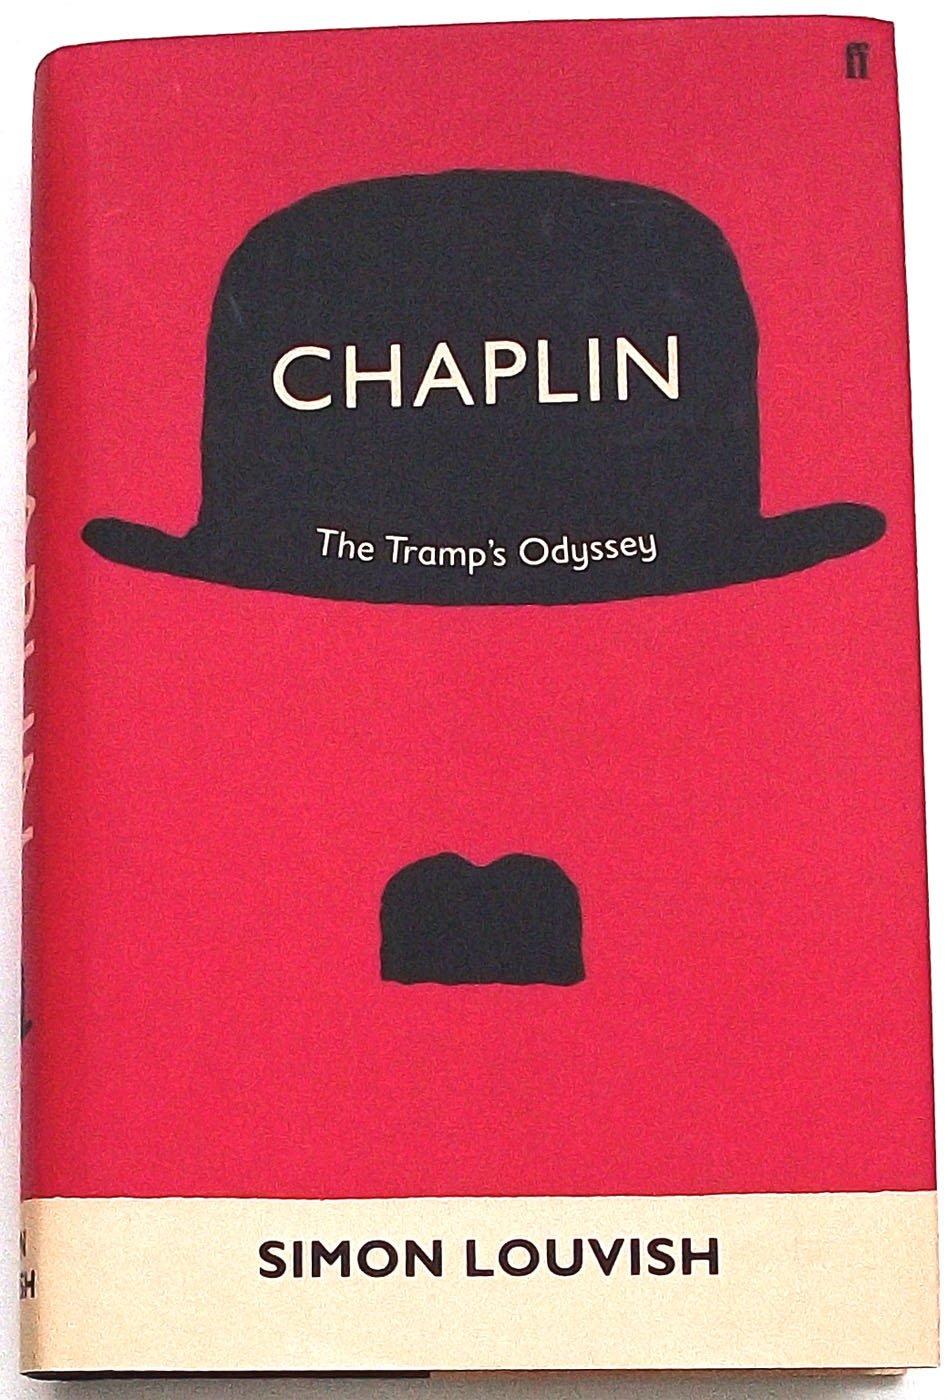 Chaplin The Tramp�s Odyssey by Simon Louvish First Edition 2009